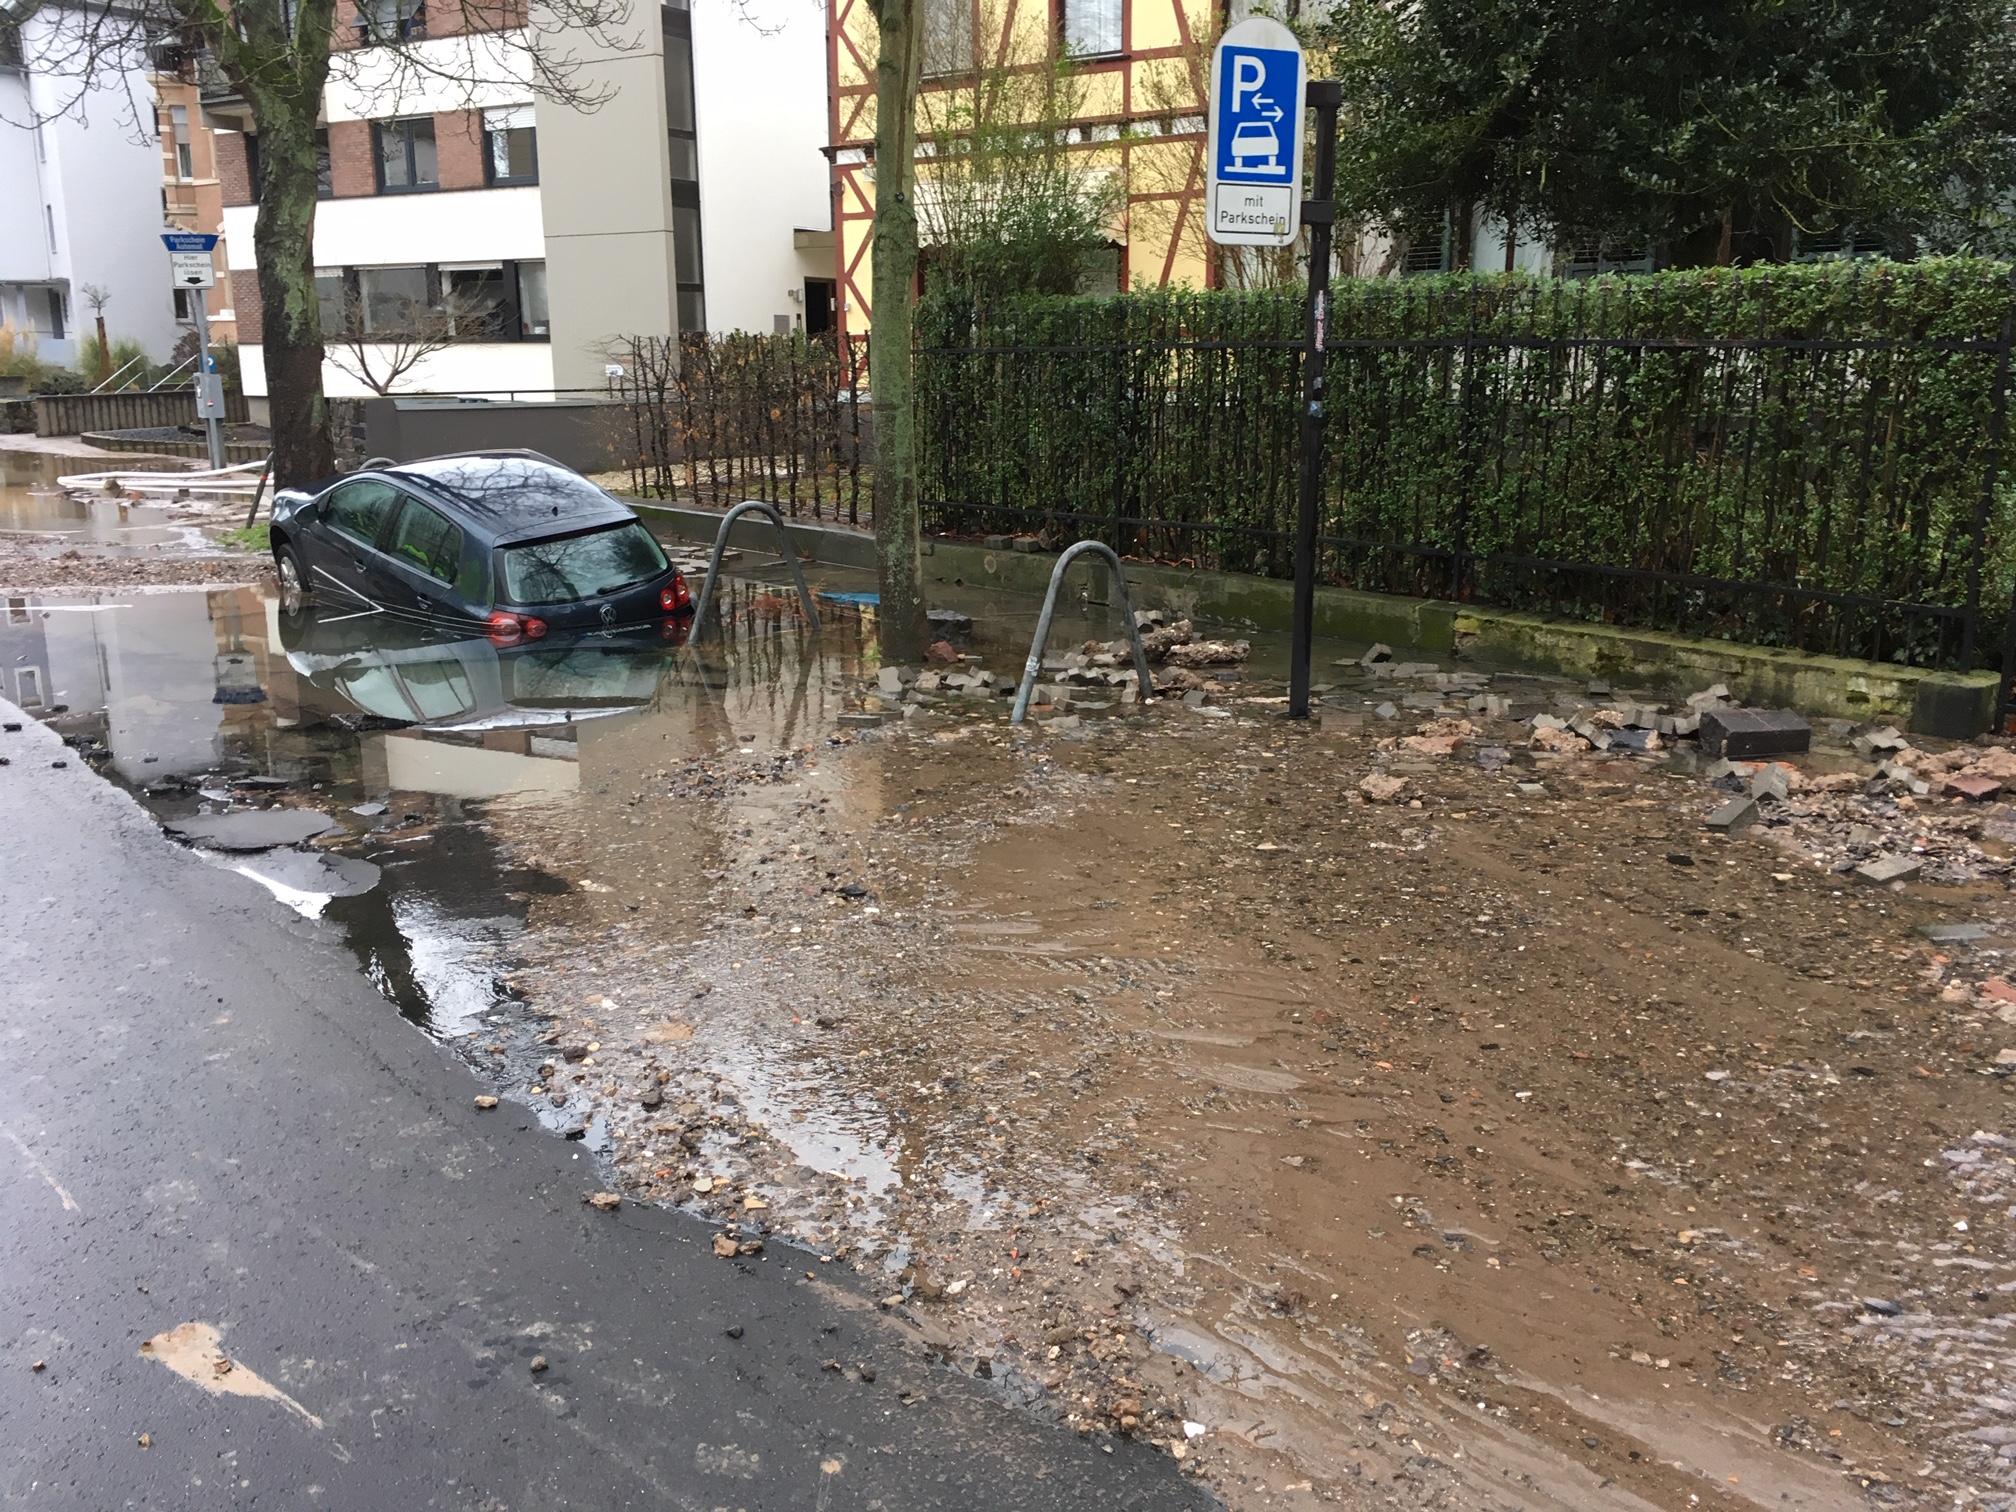 16_03_2019-Wasserrohrbruch-11